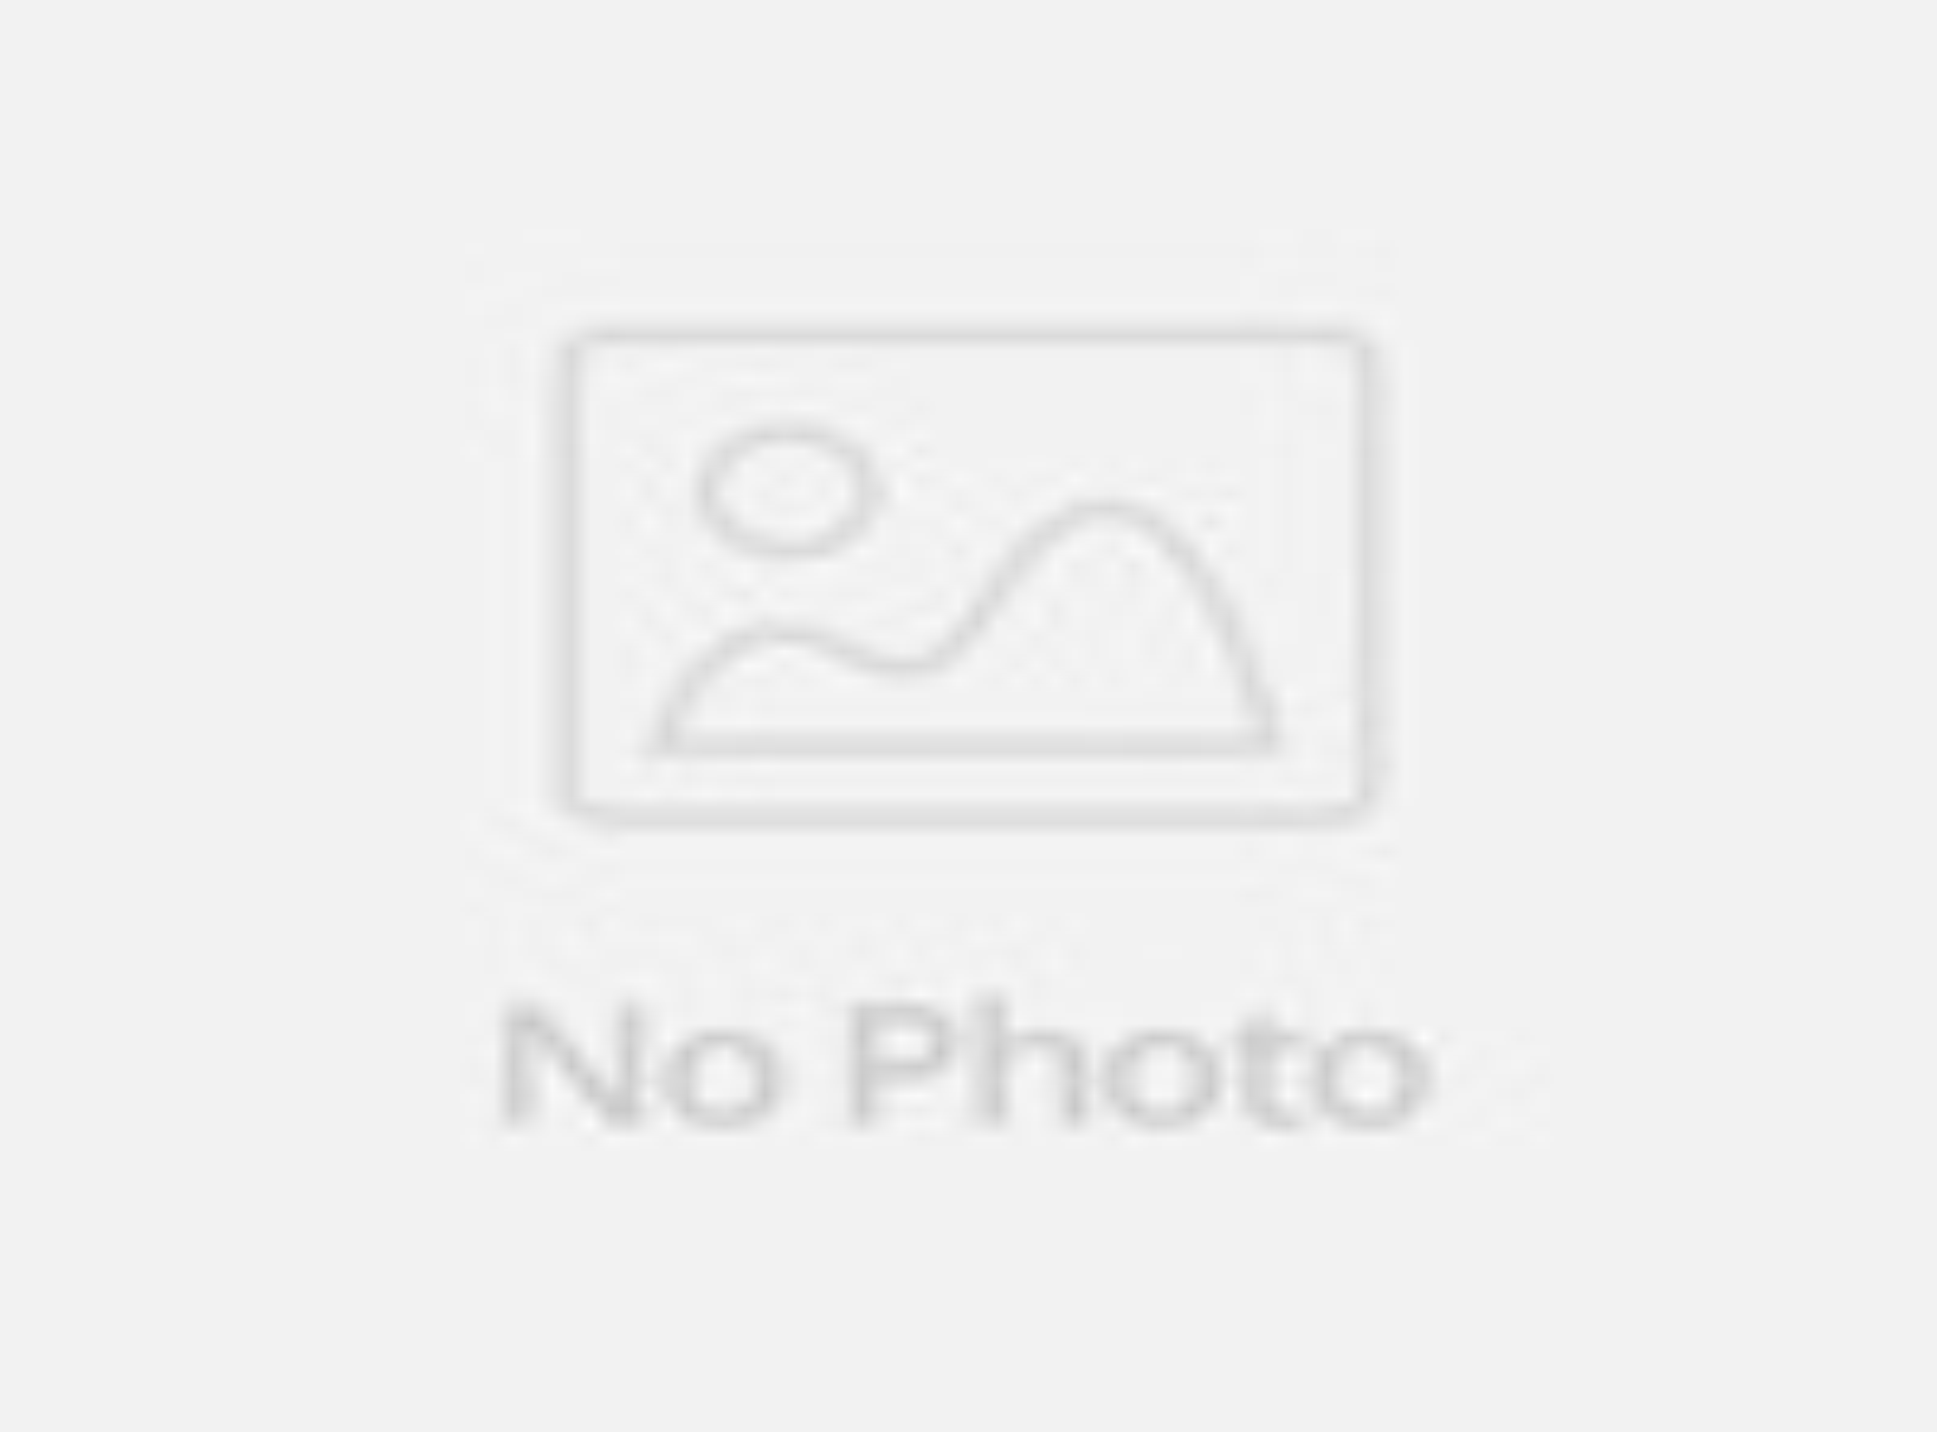 Heated Towel Rack Electric Warmer 304 Stainless Steel Rail Yf